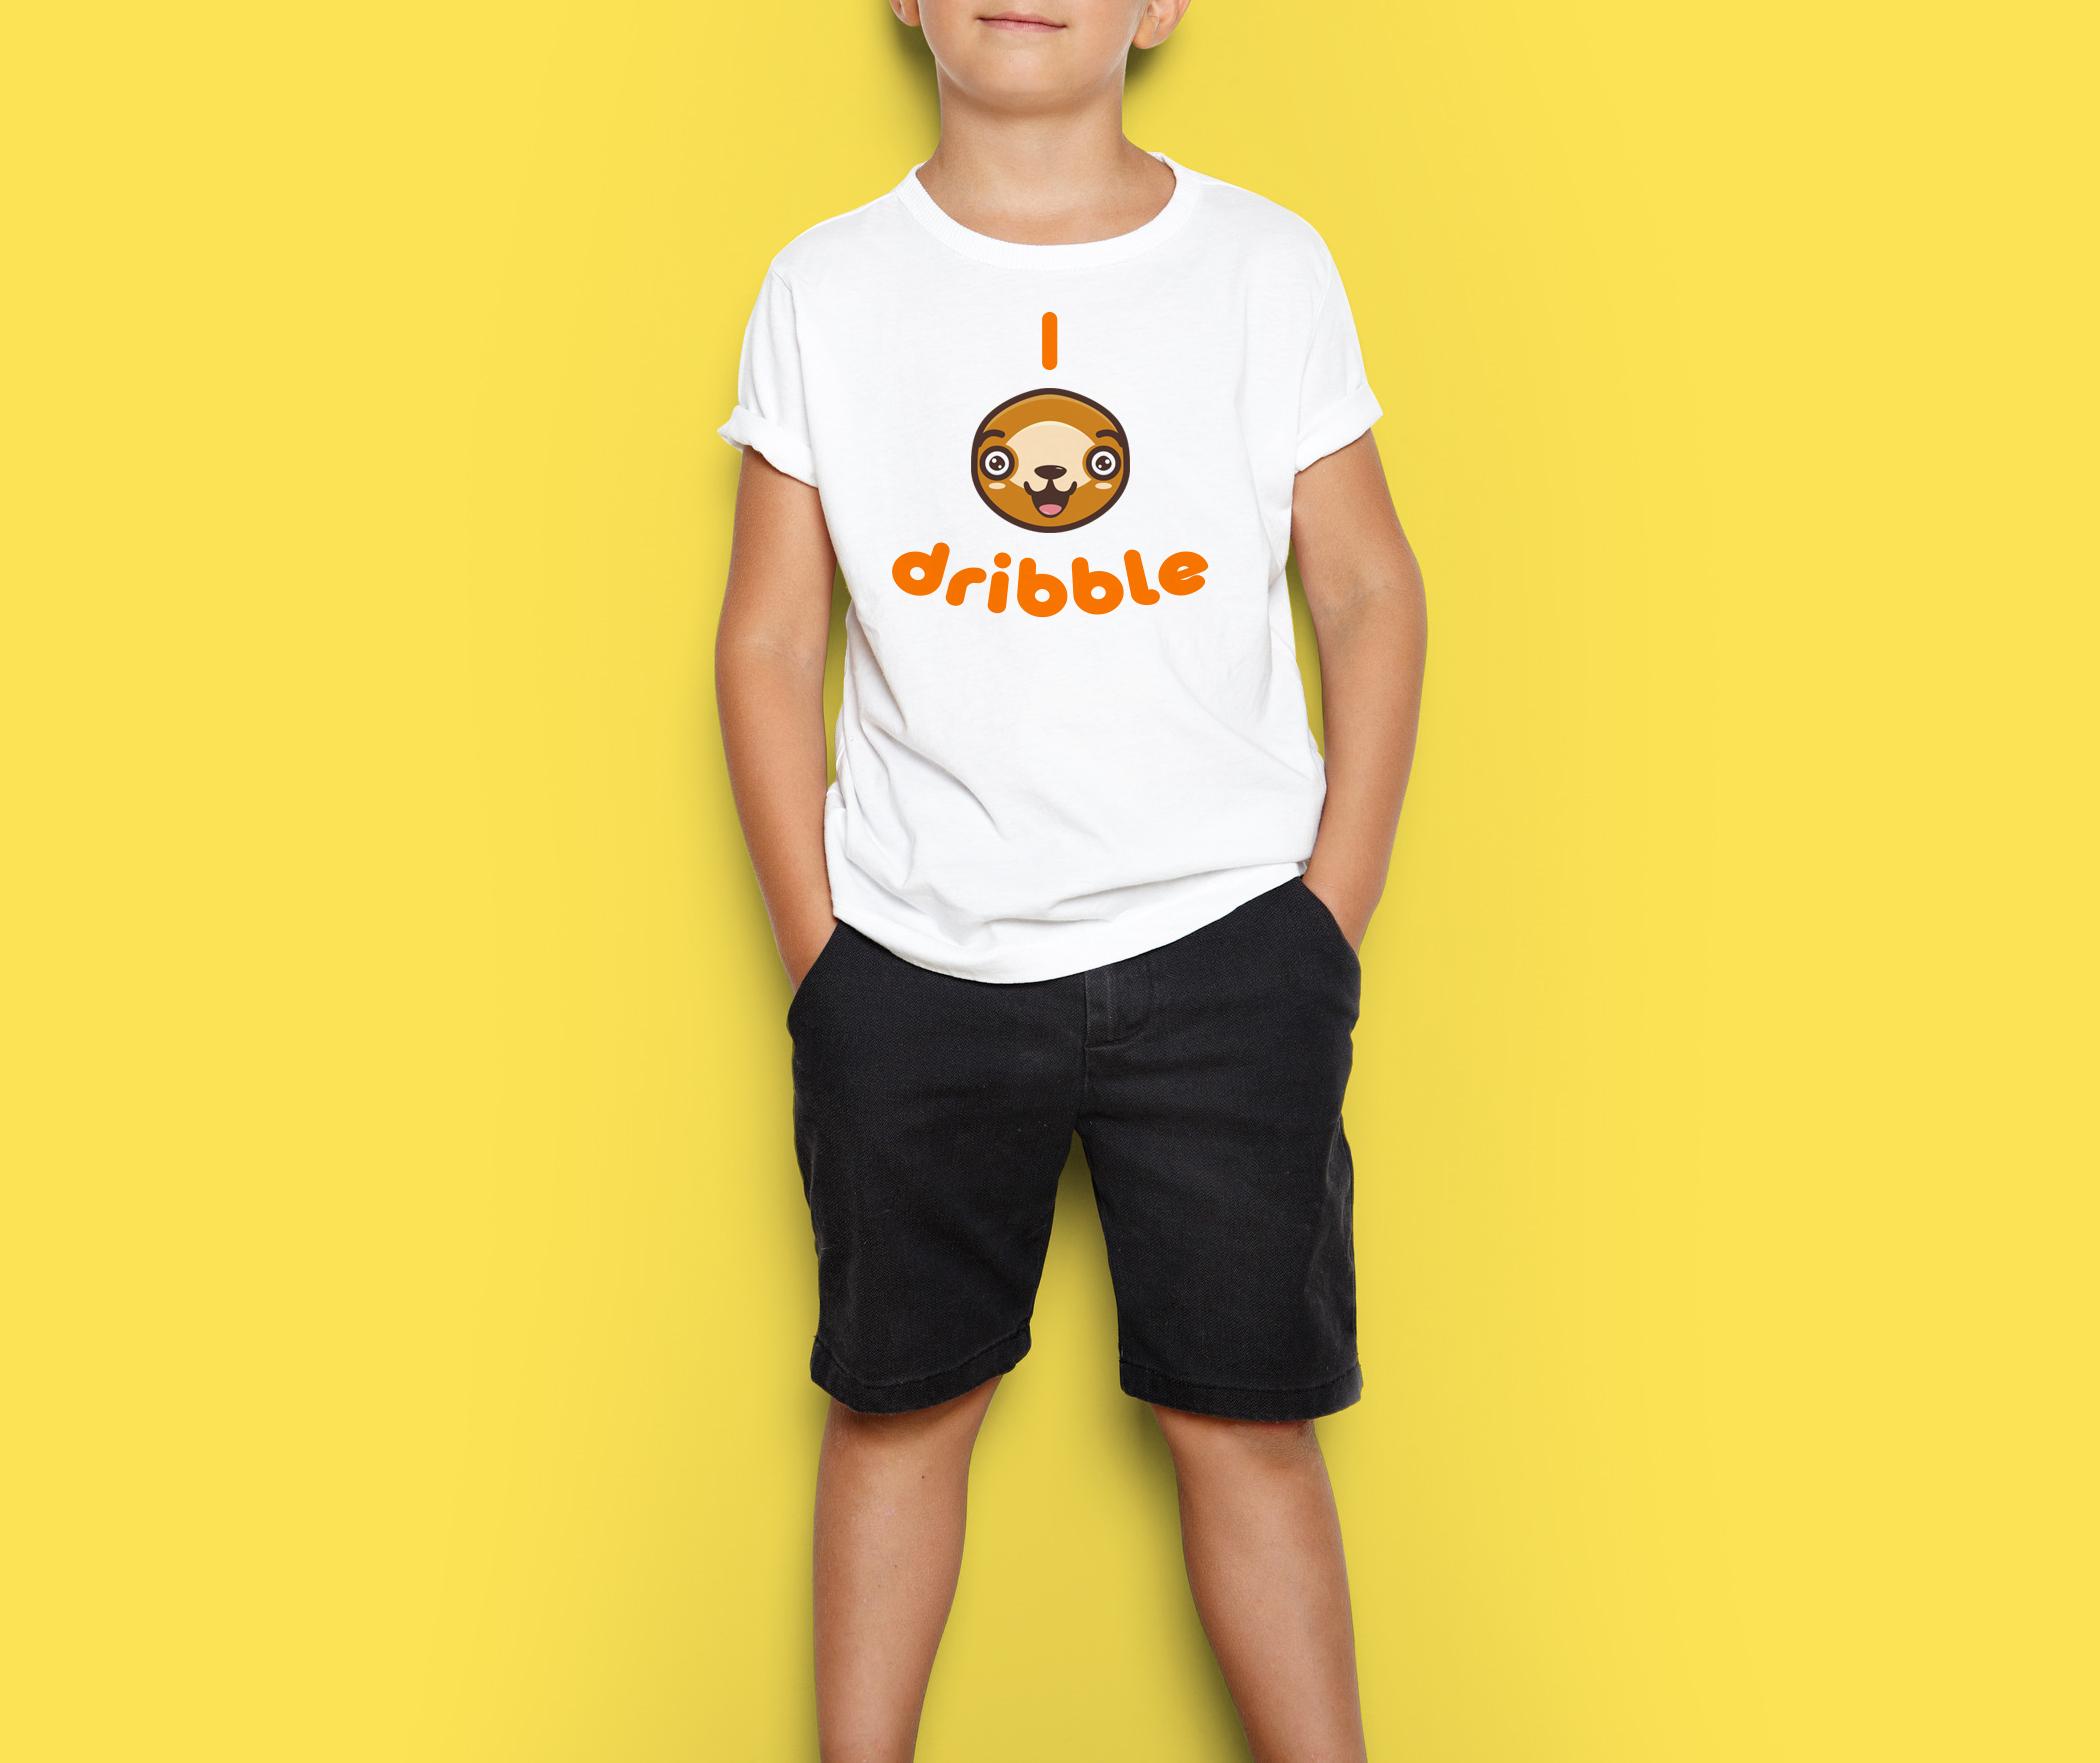 Разработка логотипа для сайта Dribbl.ru фото f_7745a9b866a0c779.jpg